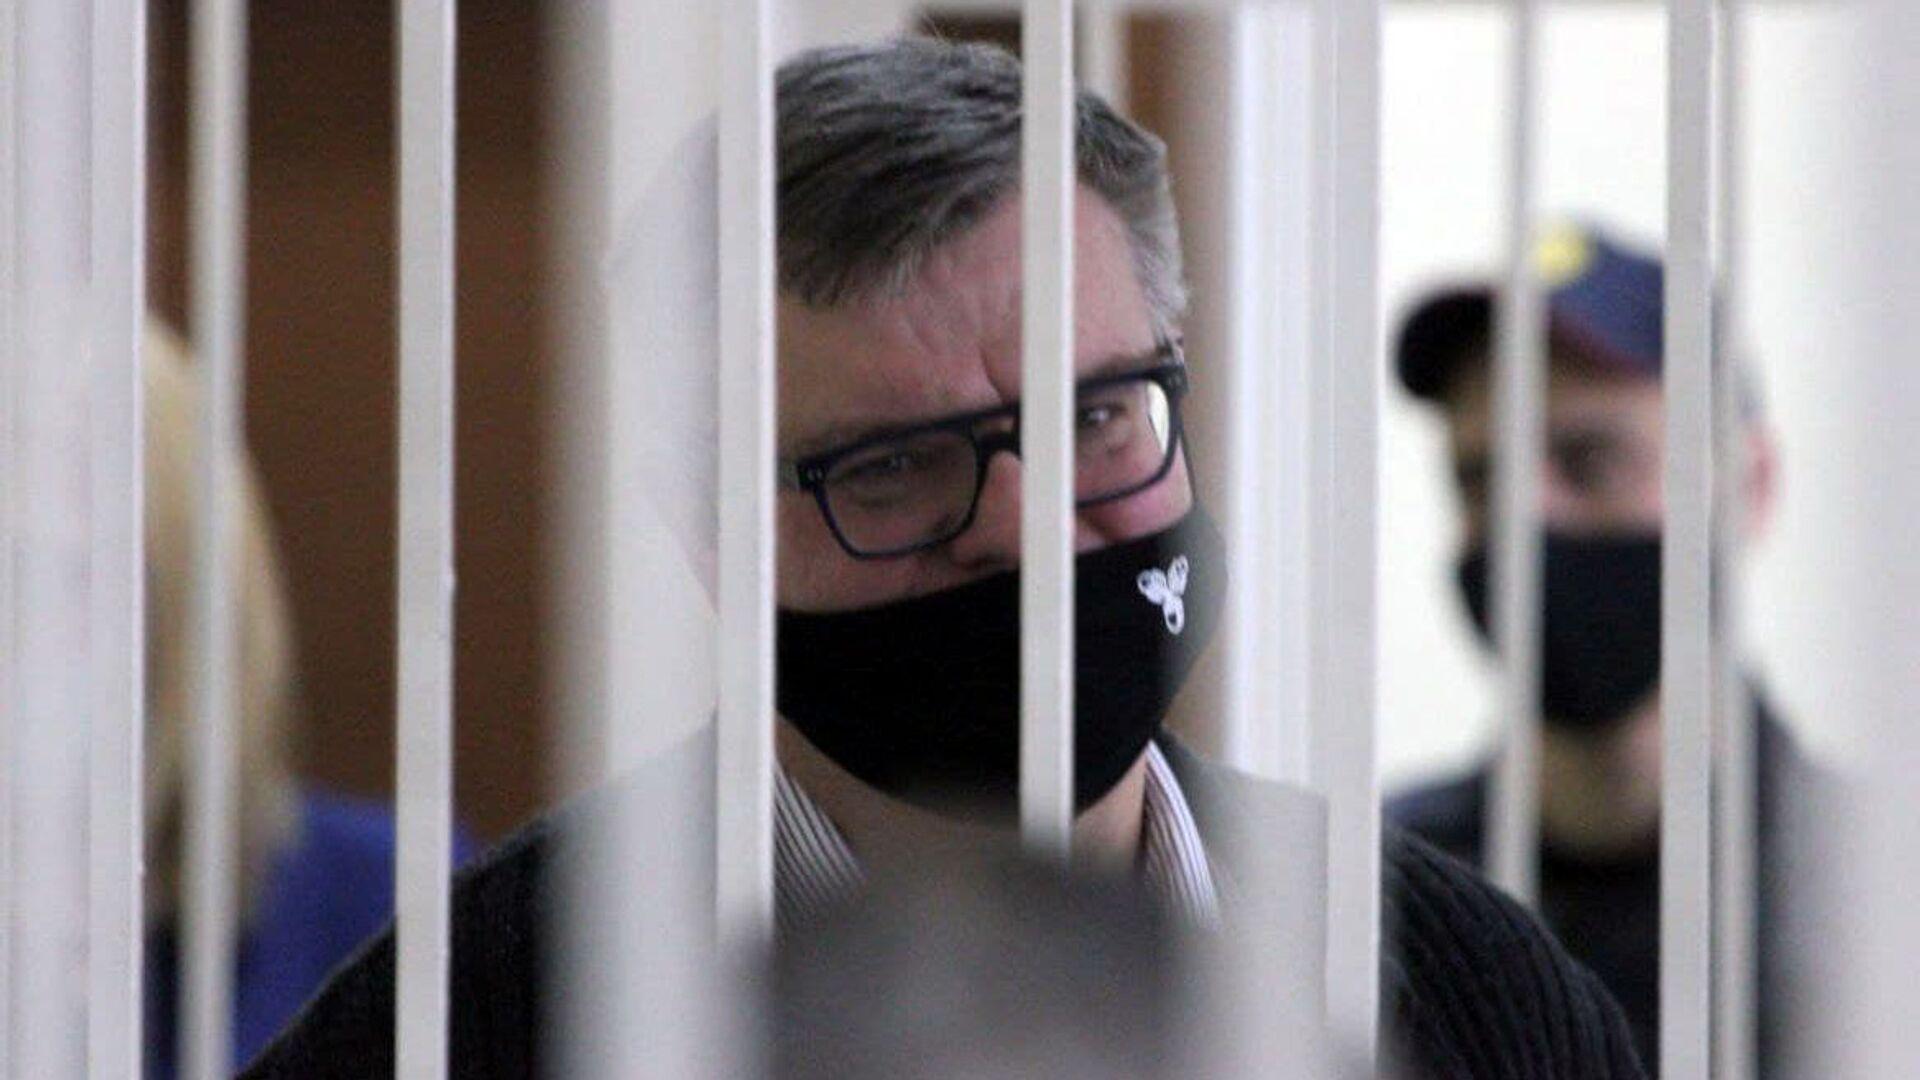 Виктор Бабарико в суде - Sputnik Беларусь, 1920, 17.02.2021